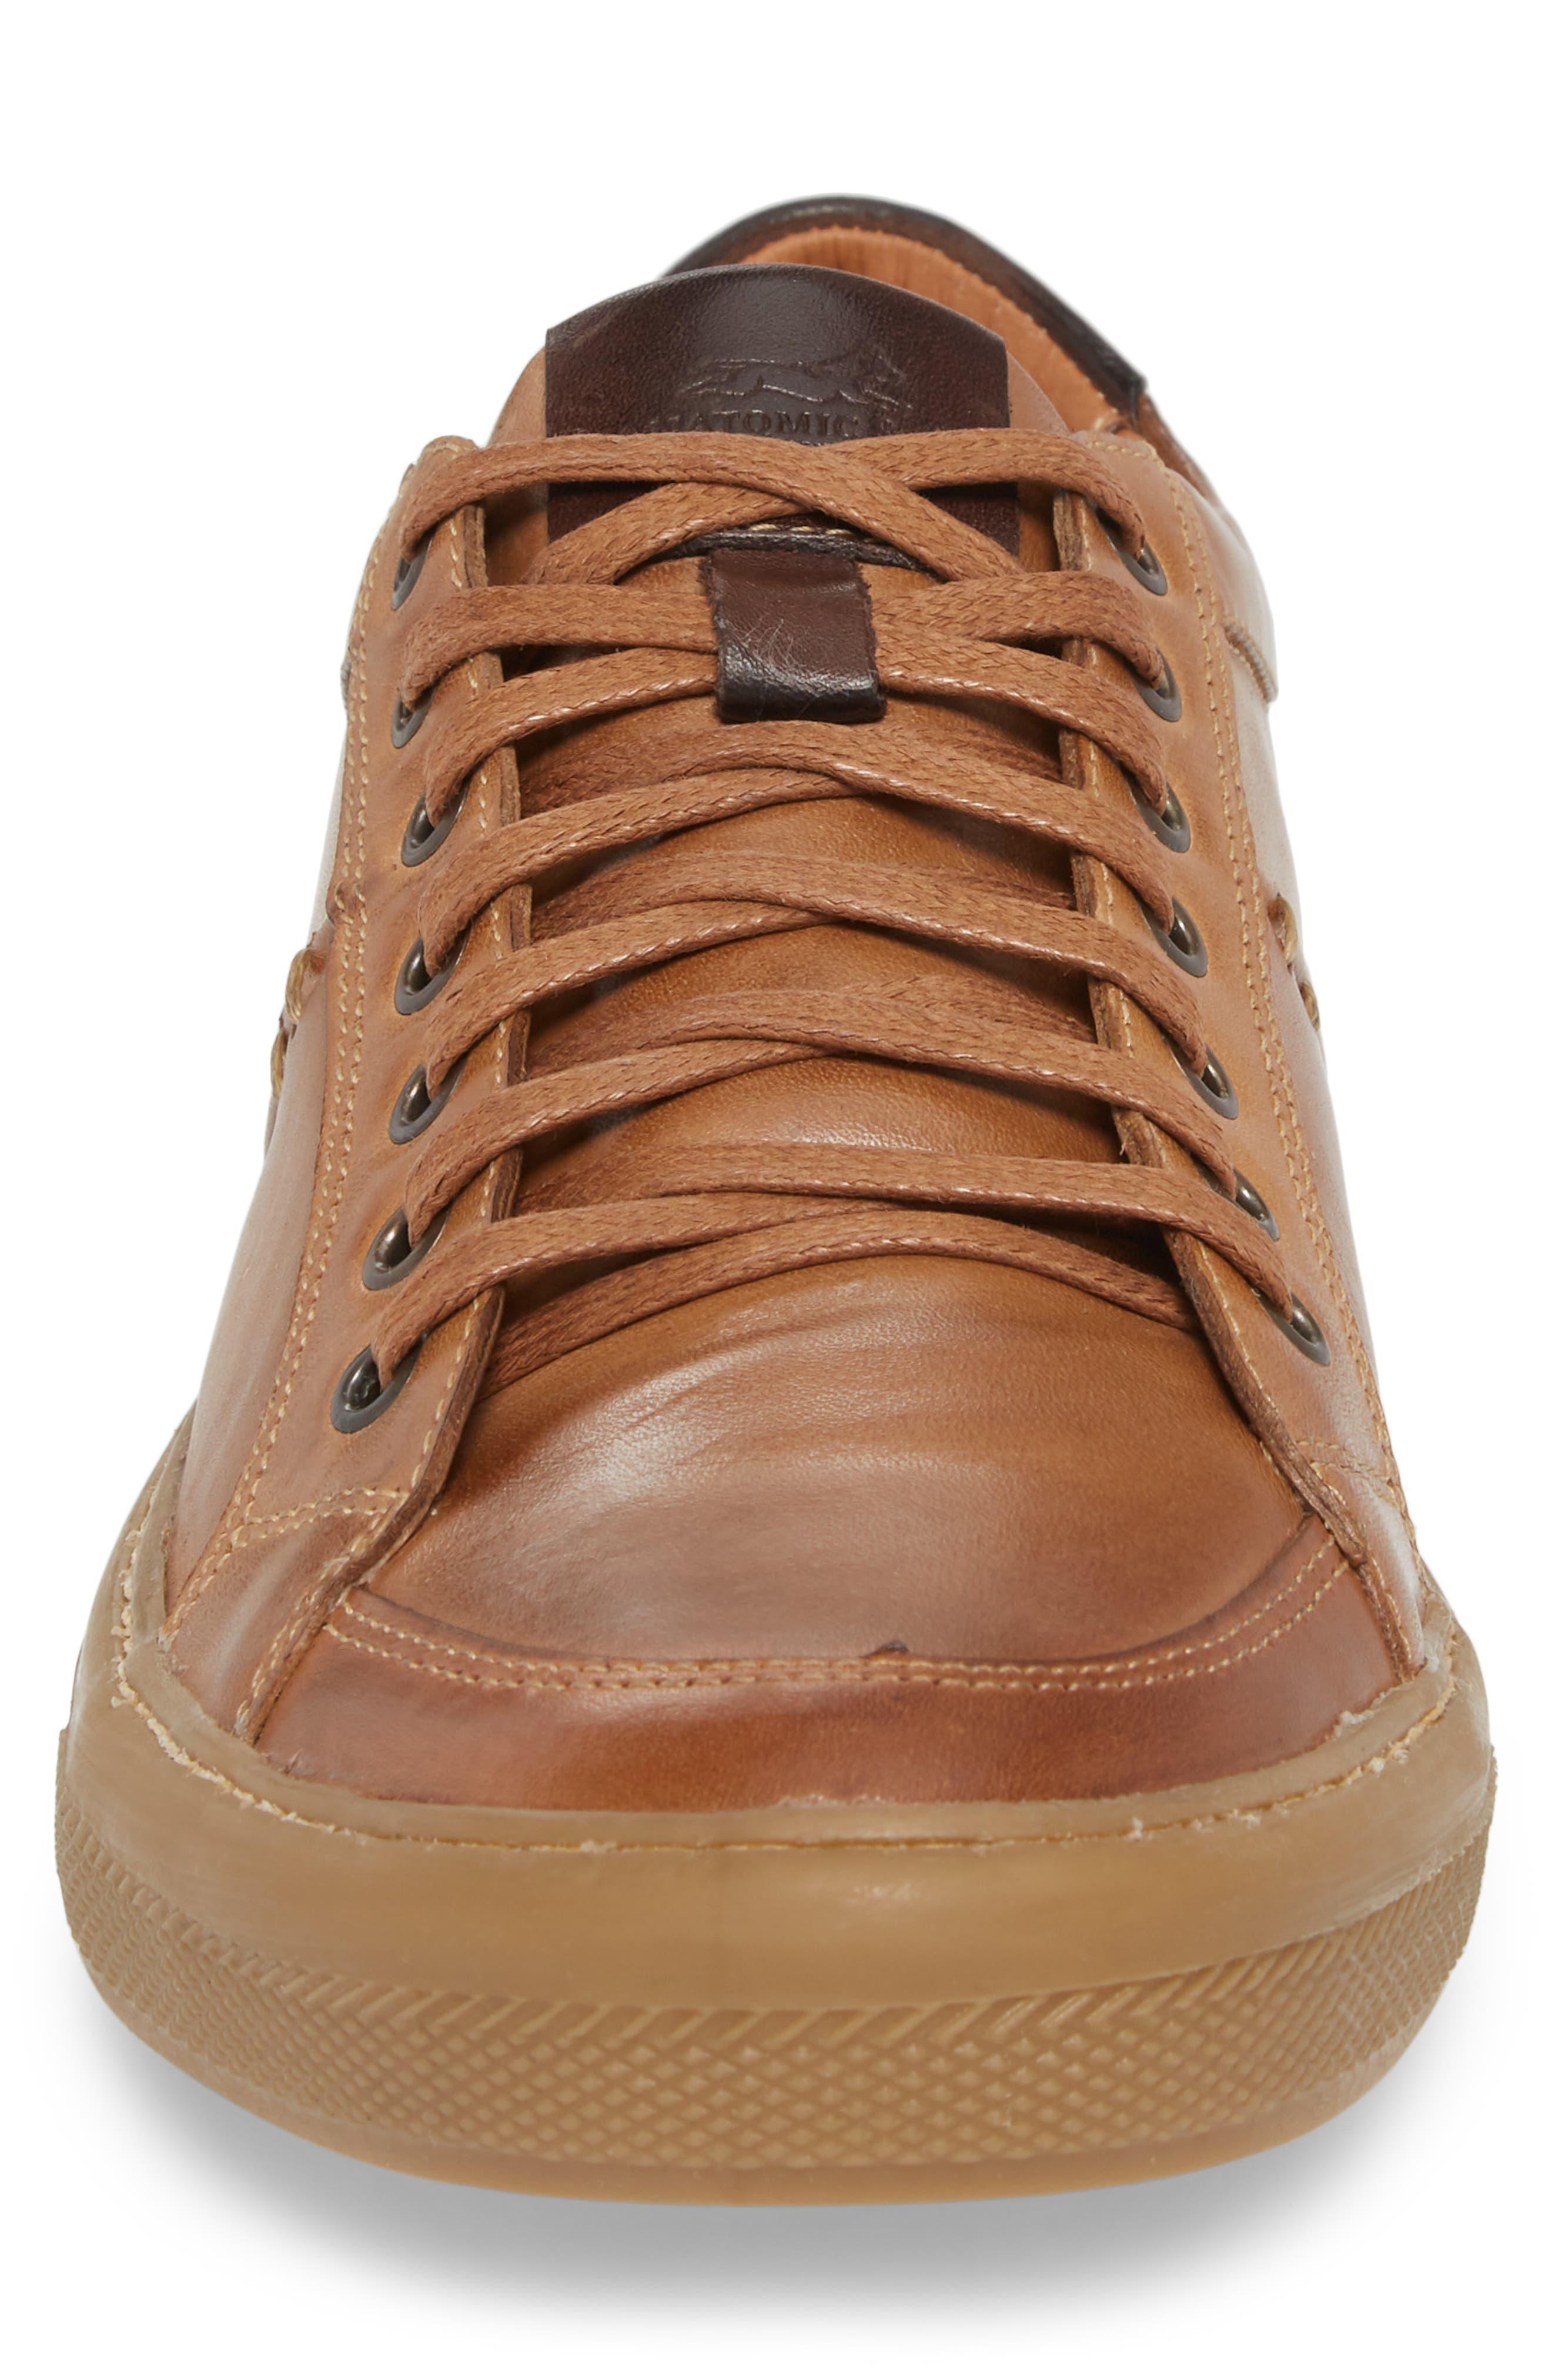 Bilac Low Top Sneaker,                             Alternate thumbnail 4, color,                             Touch Bronze/ Castanho Leather